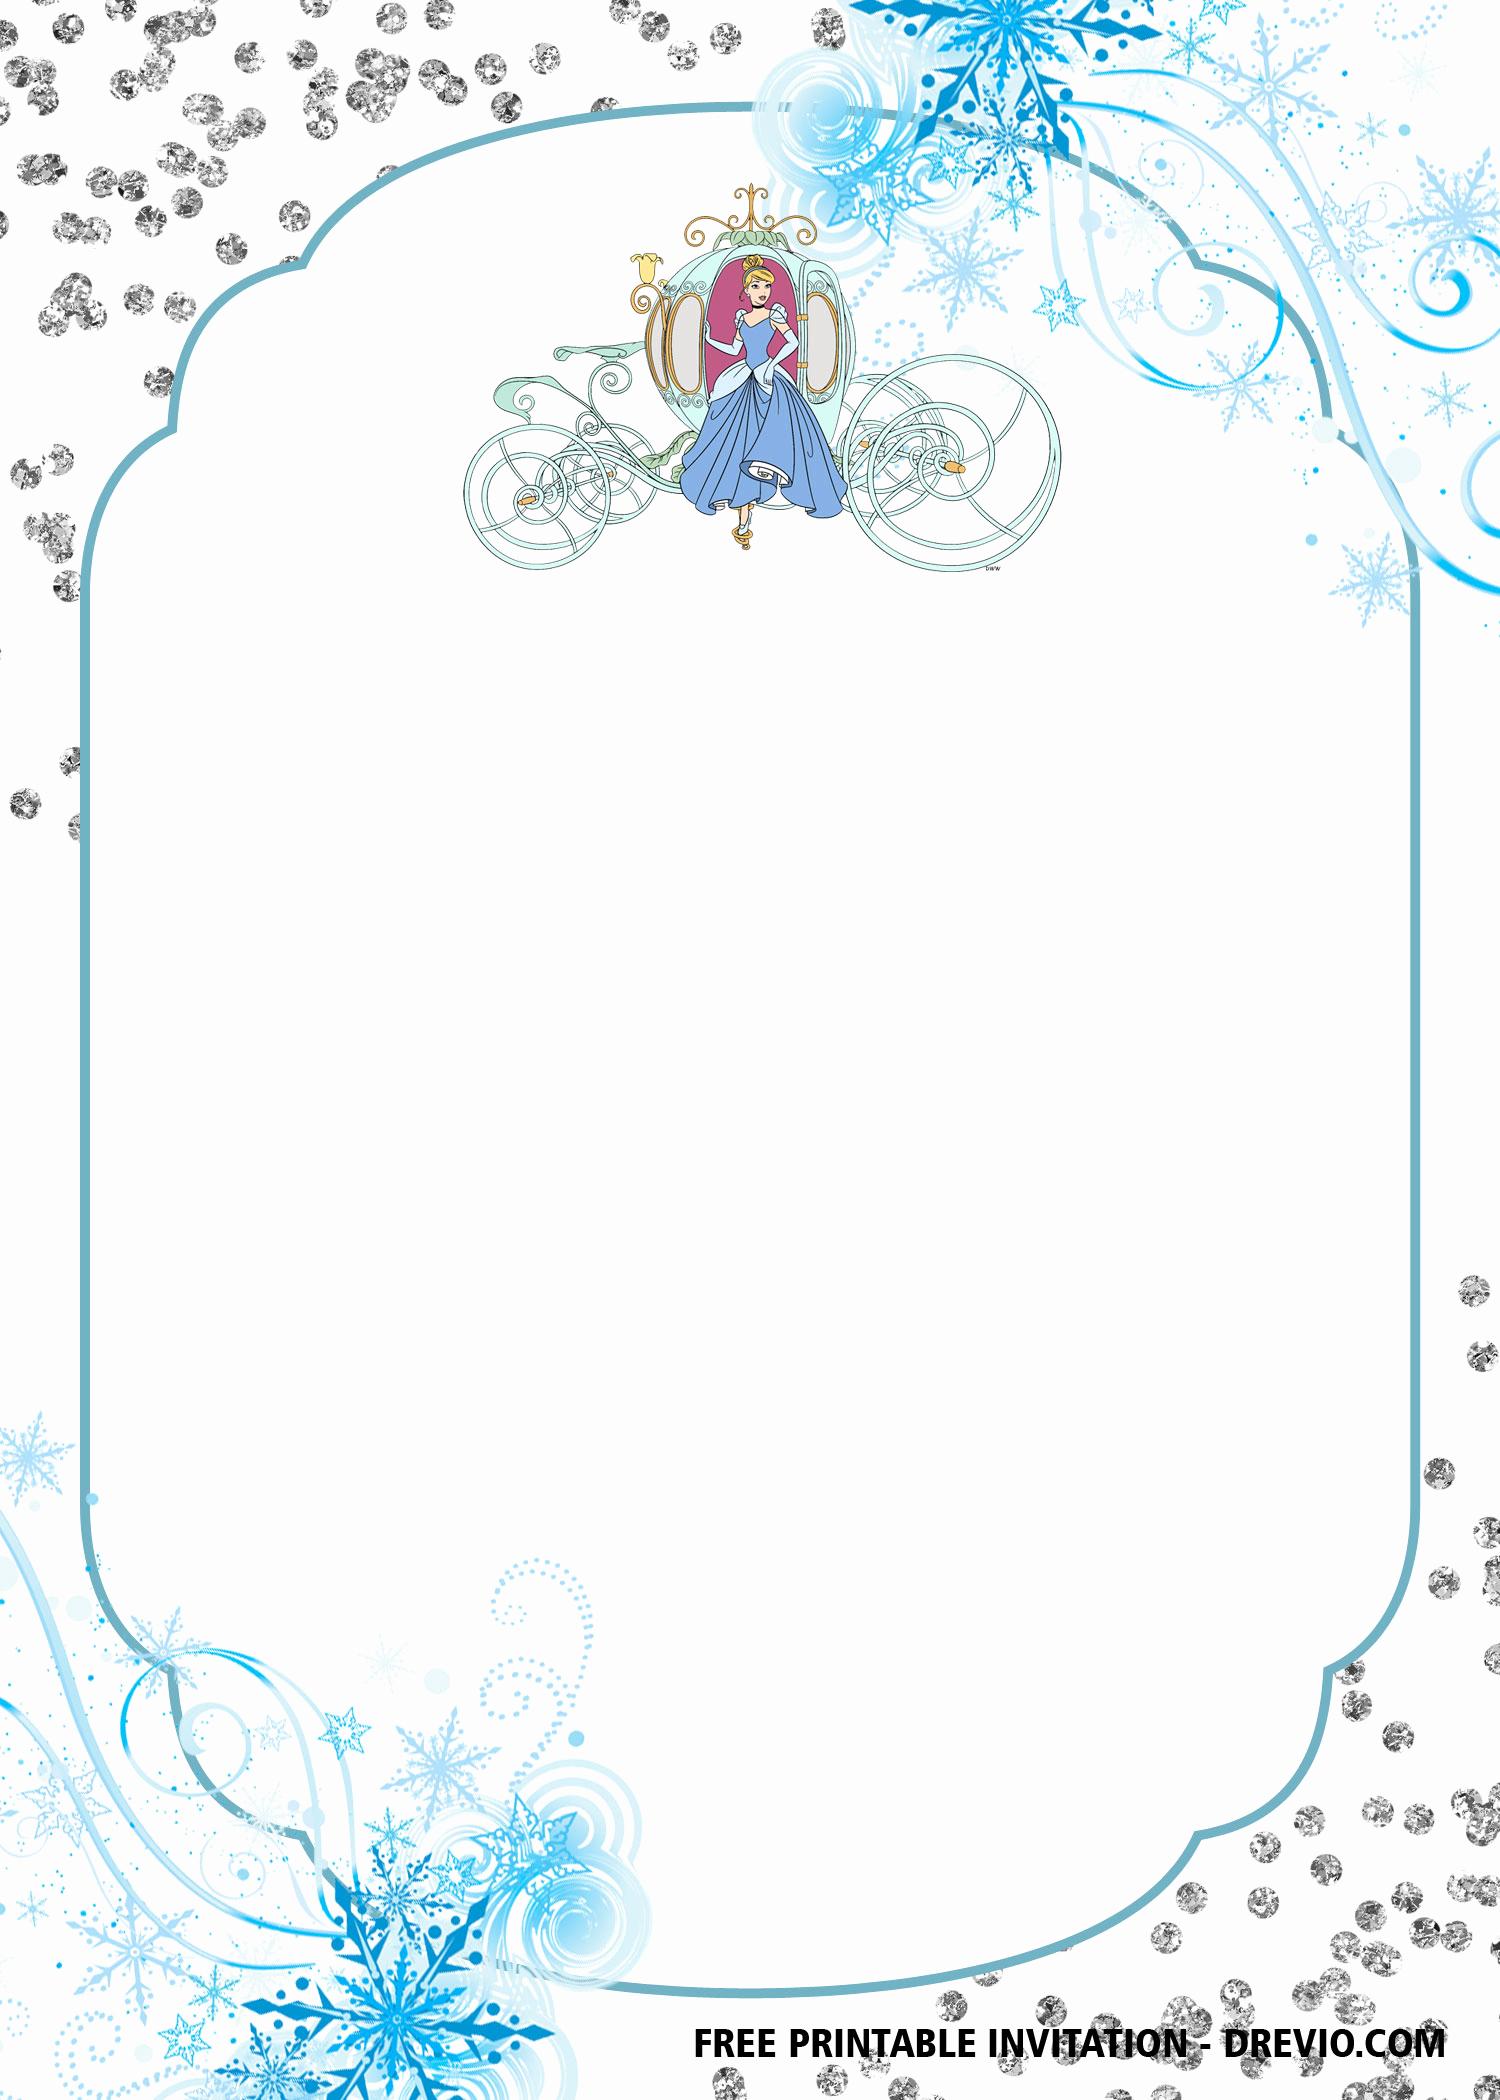 free printable cinderella chariot disney invitation templates